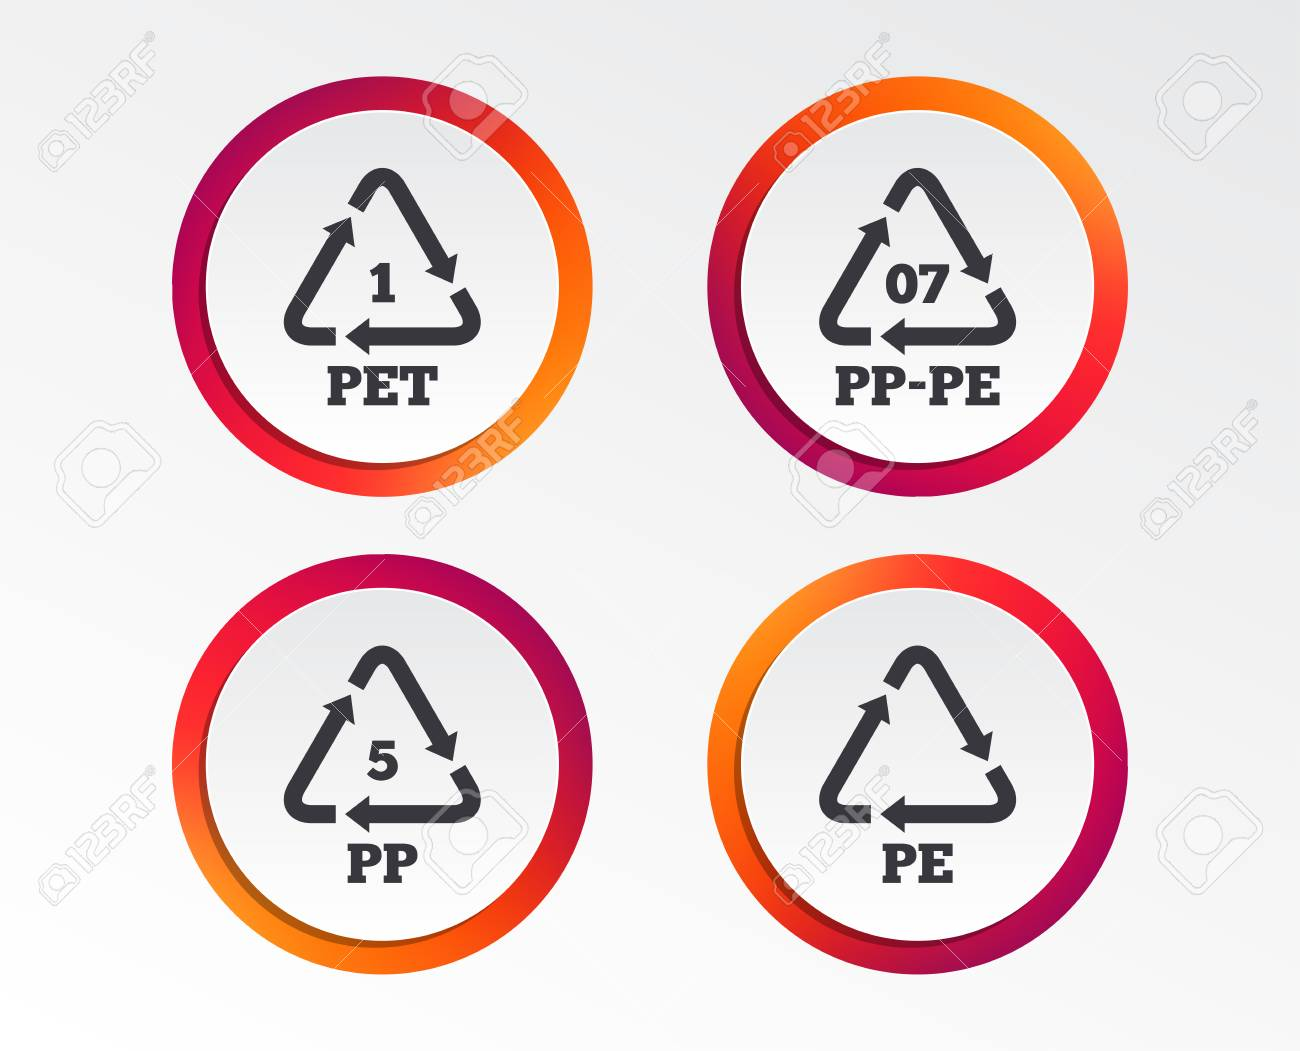 PET 1, PP-pe 07, PP 5 and PE icons  High-density Polyethylene